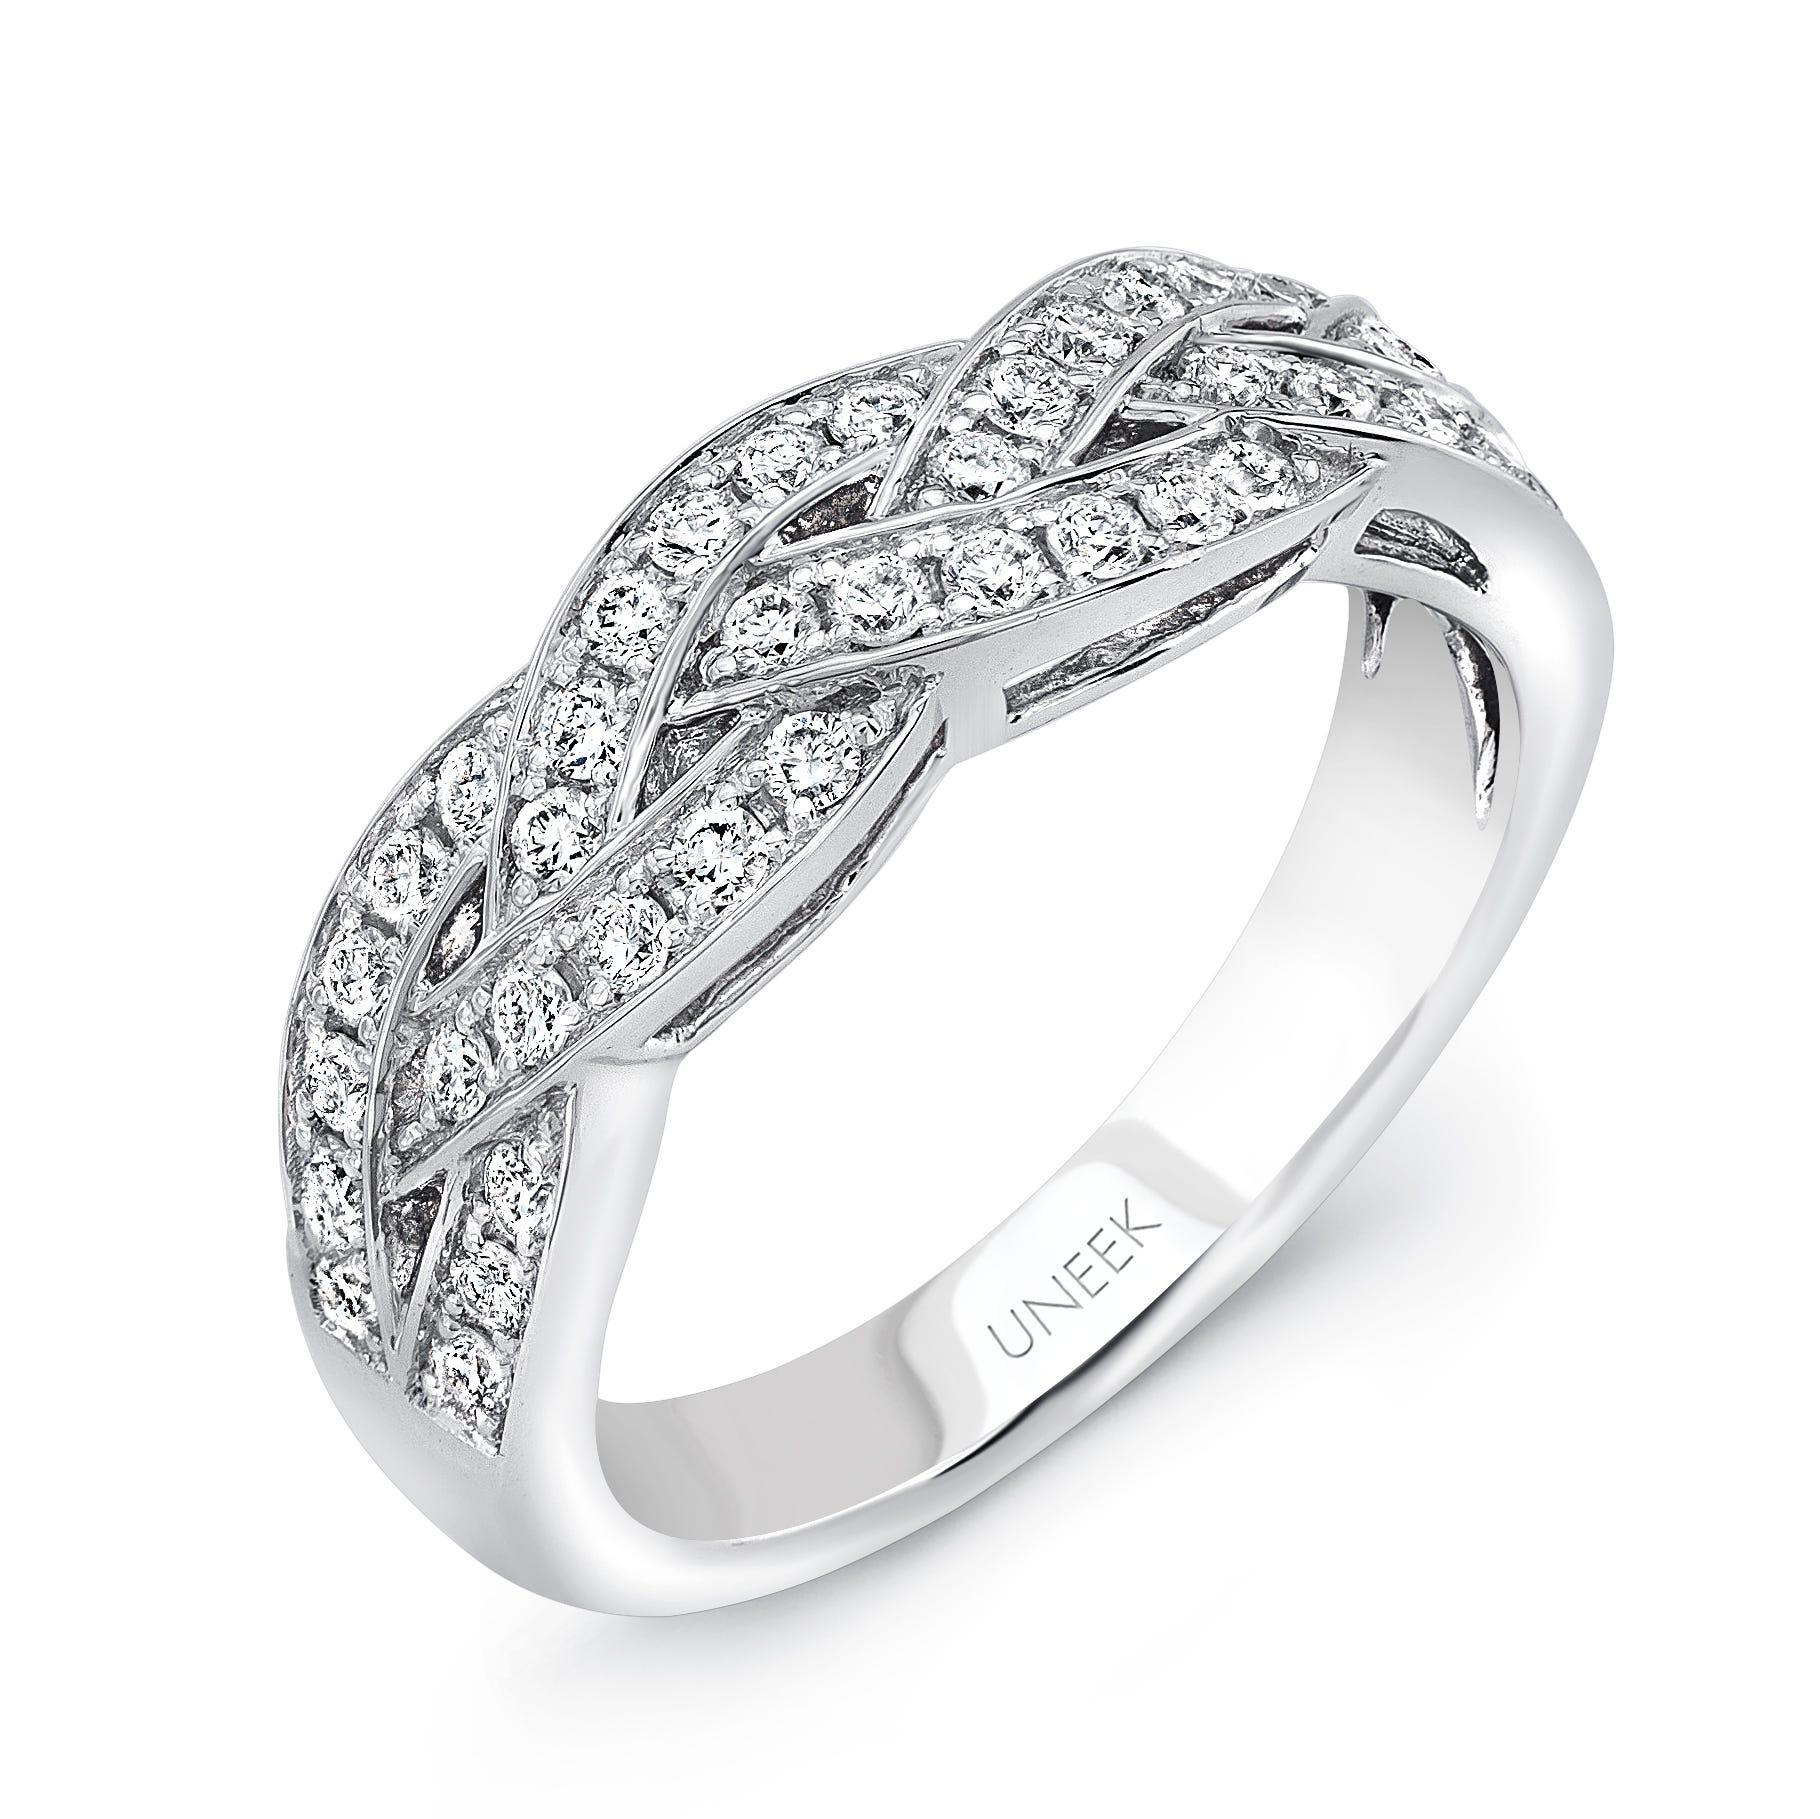 Uneek Diamond .50ctw. Wedding Band in 14K White Gold SWS205